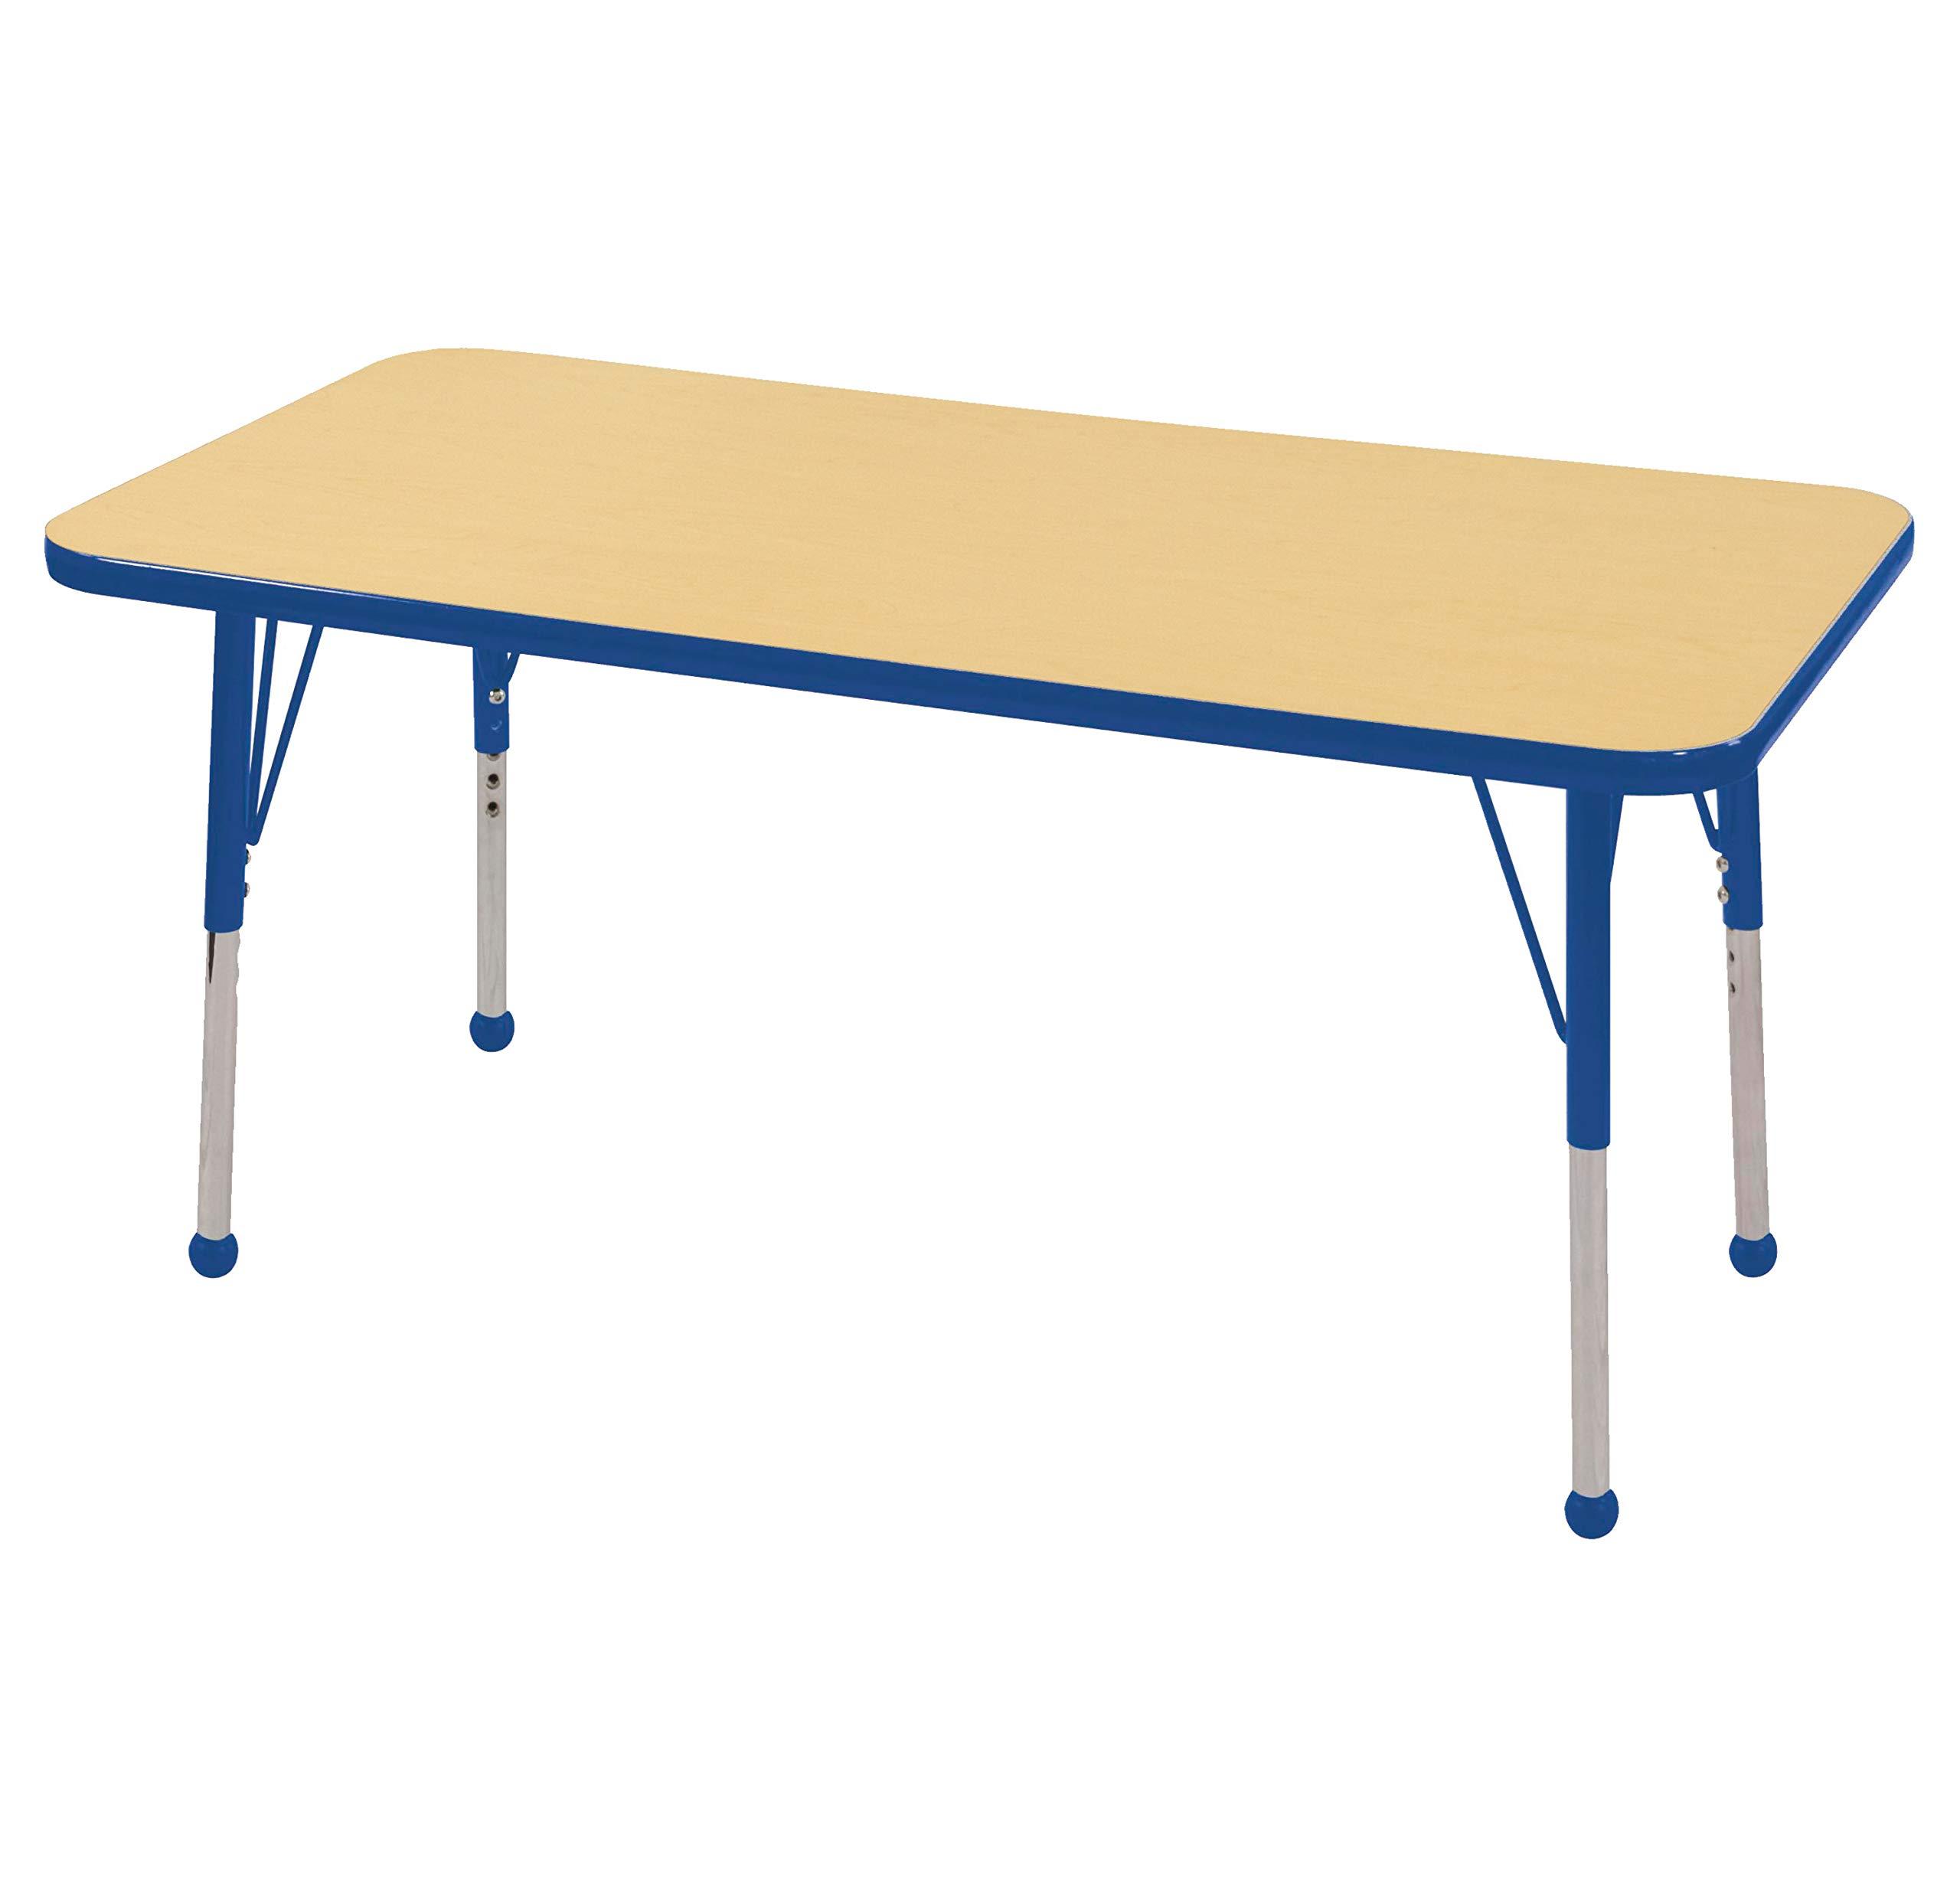 ECR4Kids Mesa Everyday 24'' x 48'' Rectangular School Activity Table, Standard Legs w/ Ball Glides, Adjustable Height 19-30 inch (Maple/Blue)